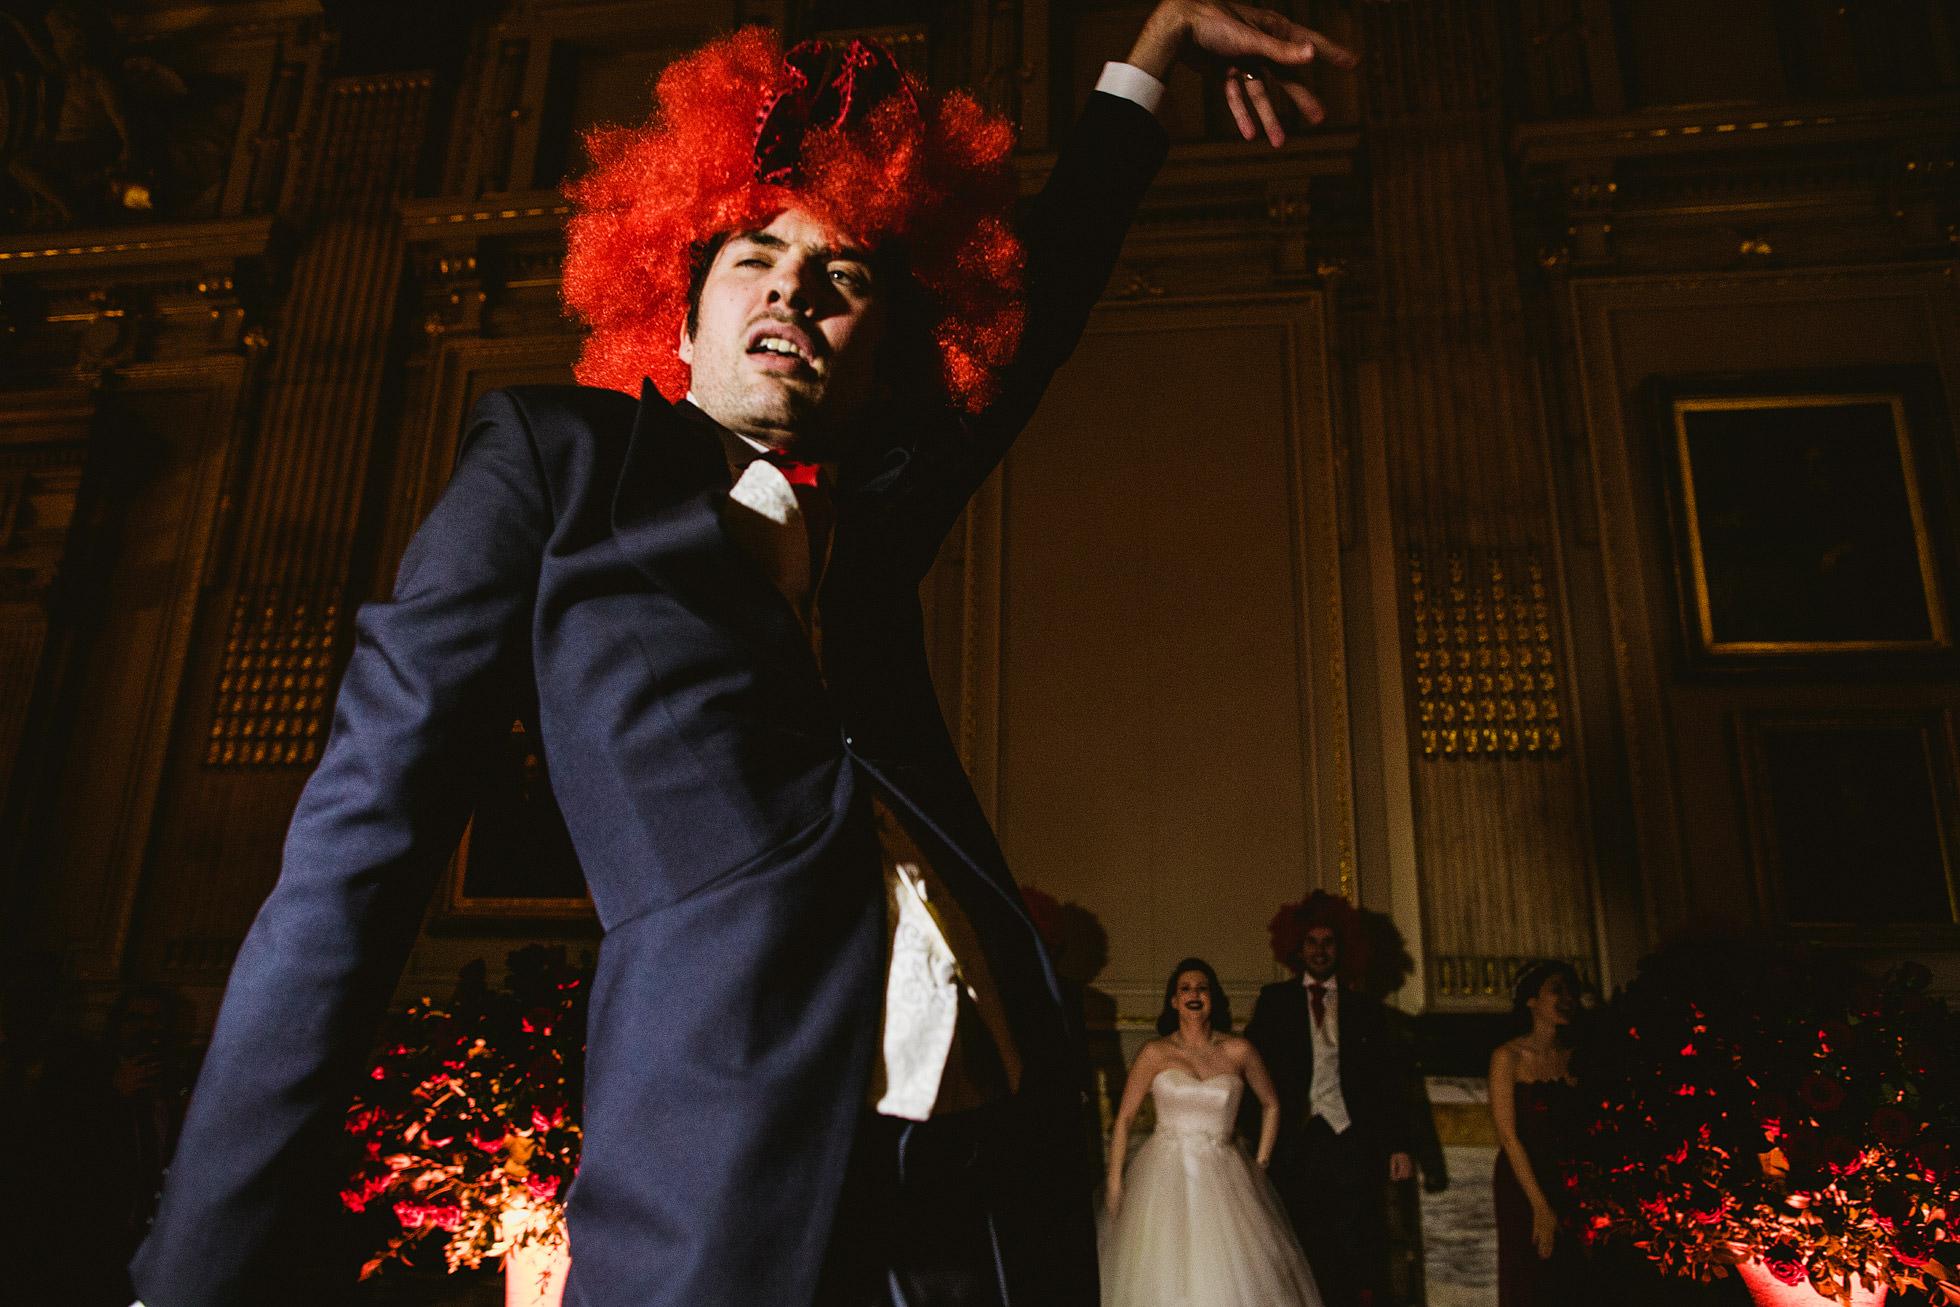 One Great George Street Wedding Photographer